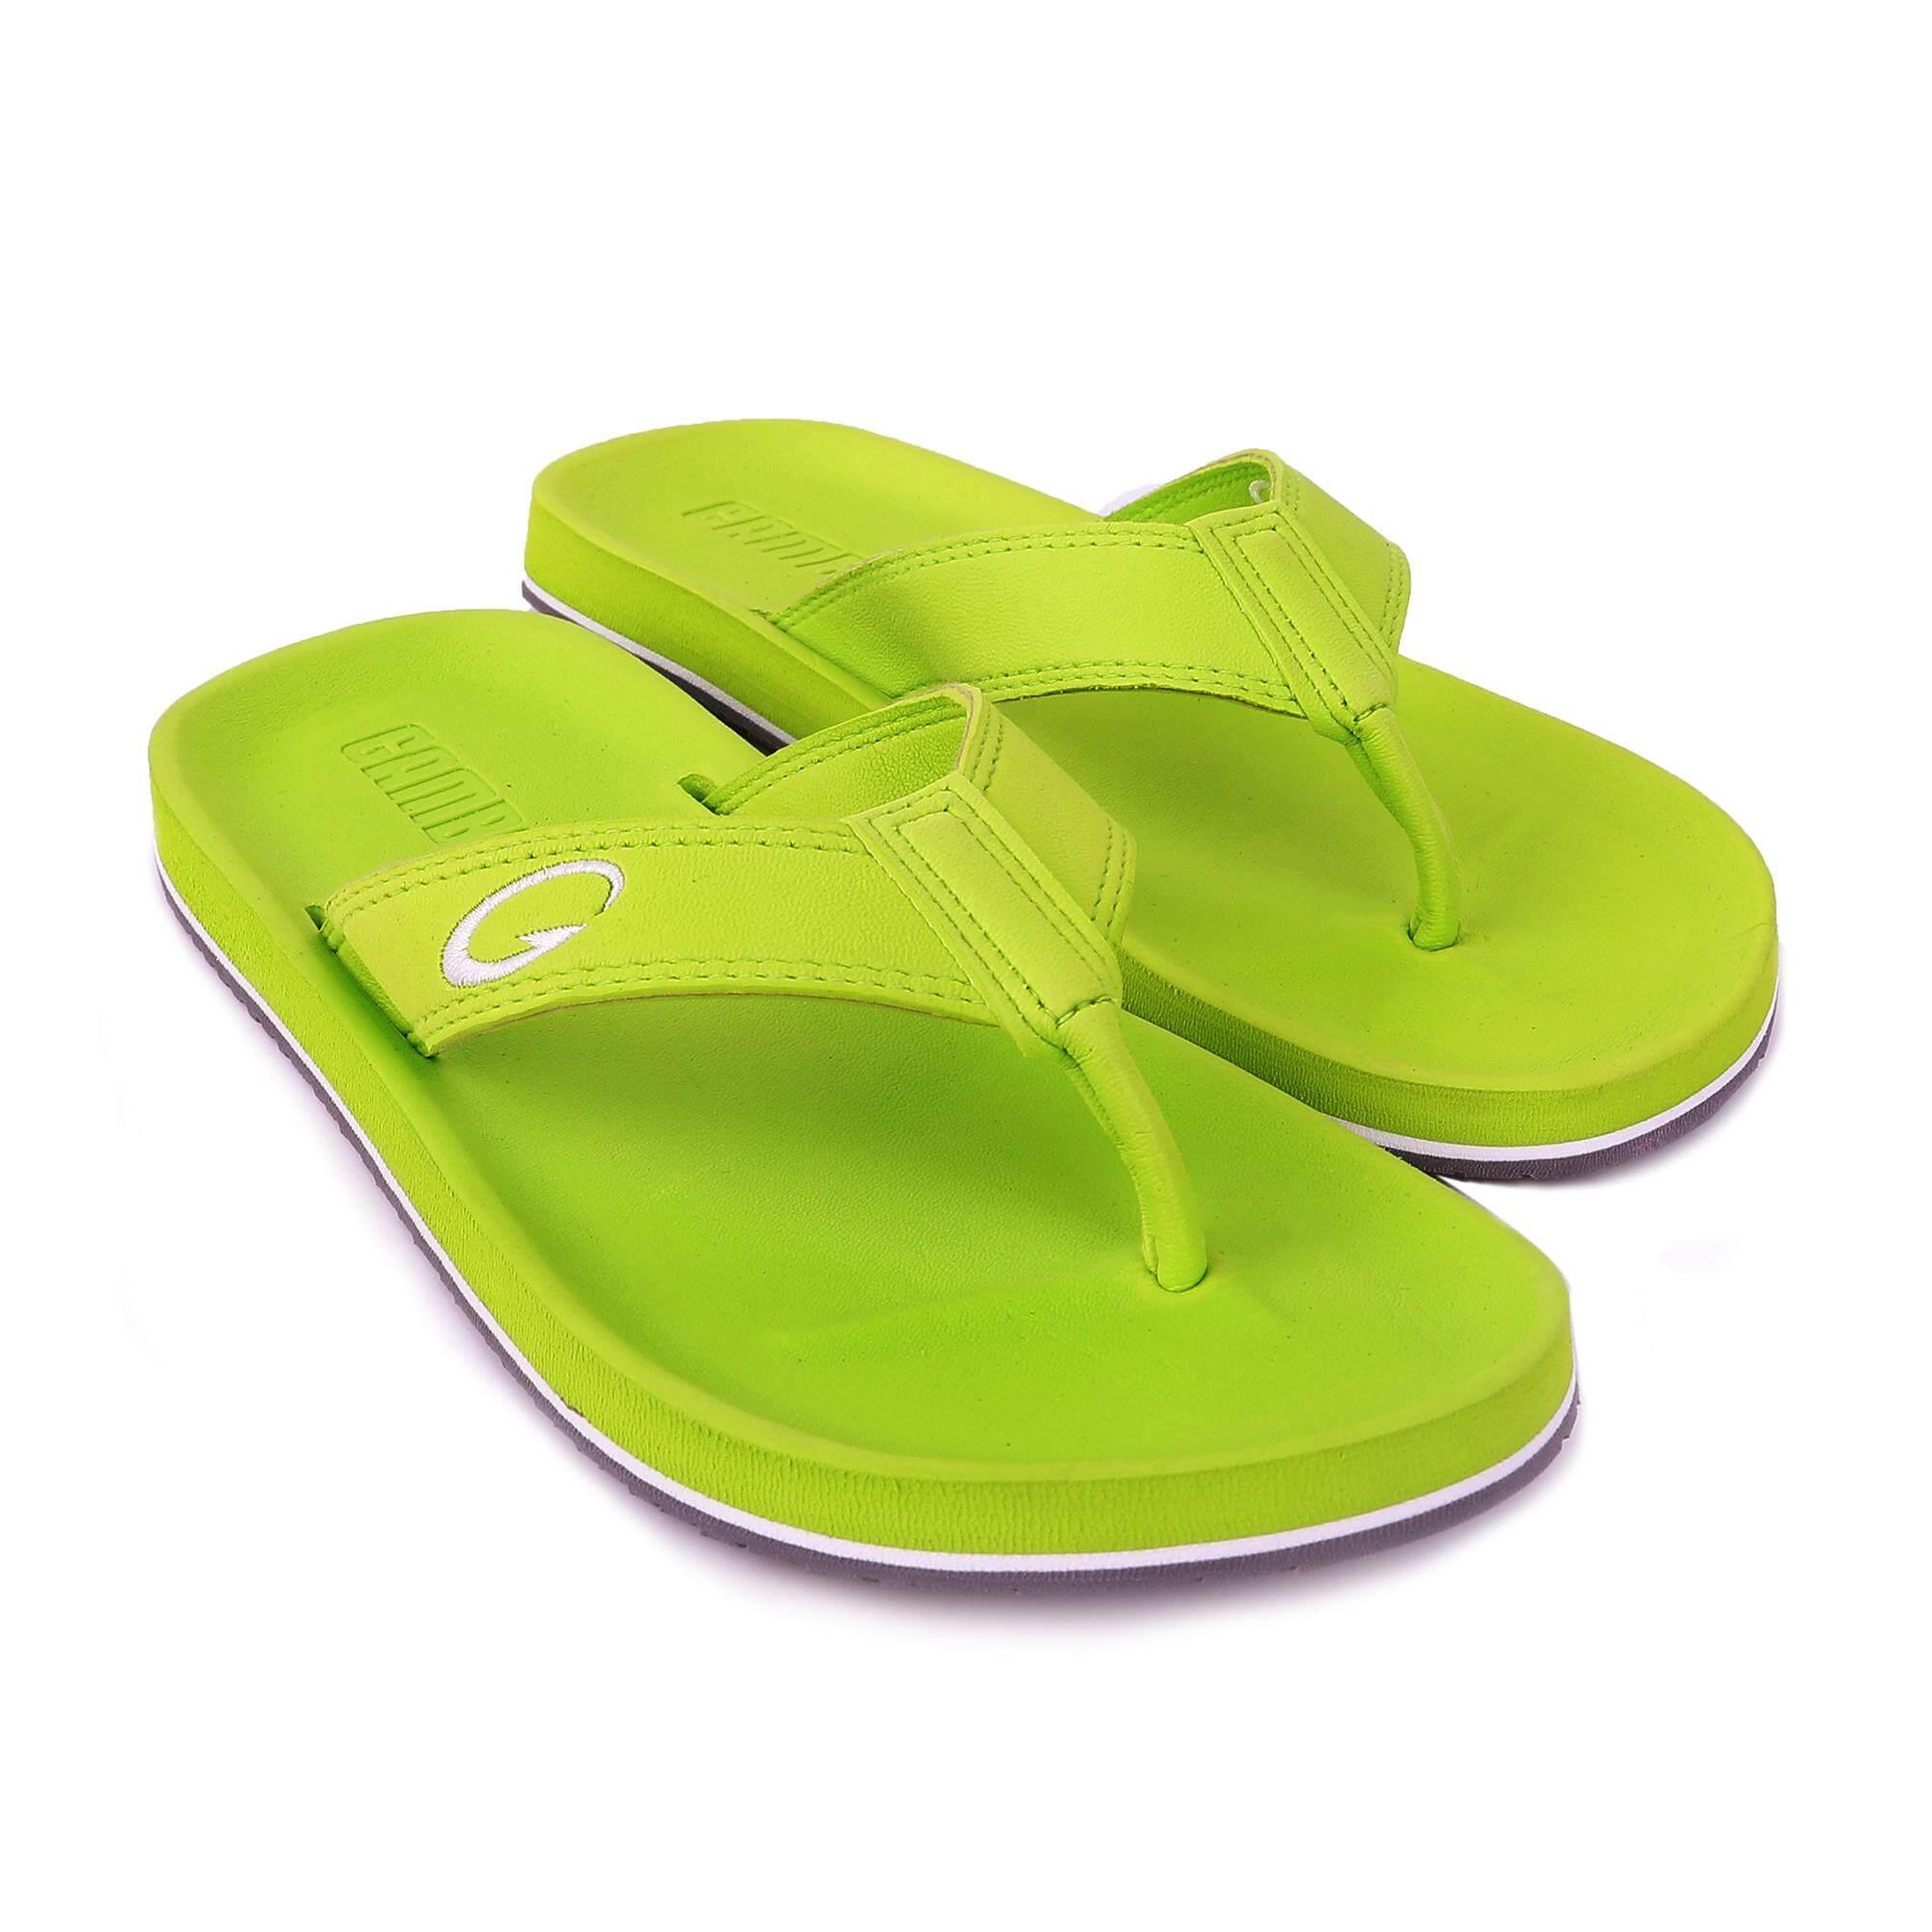 GAMBOL แกมโบล รองเท้าแตะ (นุ่ม) รุ่น GW11267 - สีเขียวอ่อน